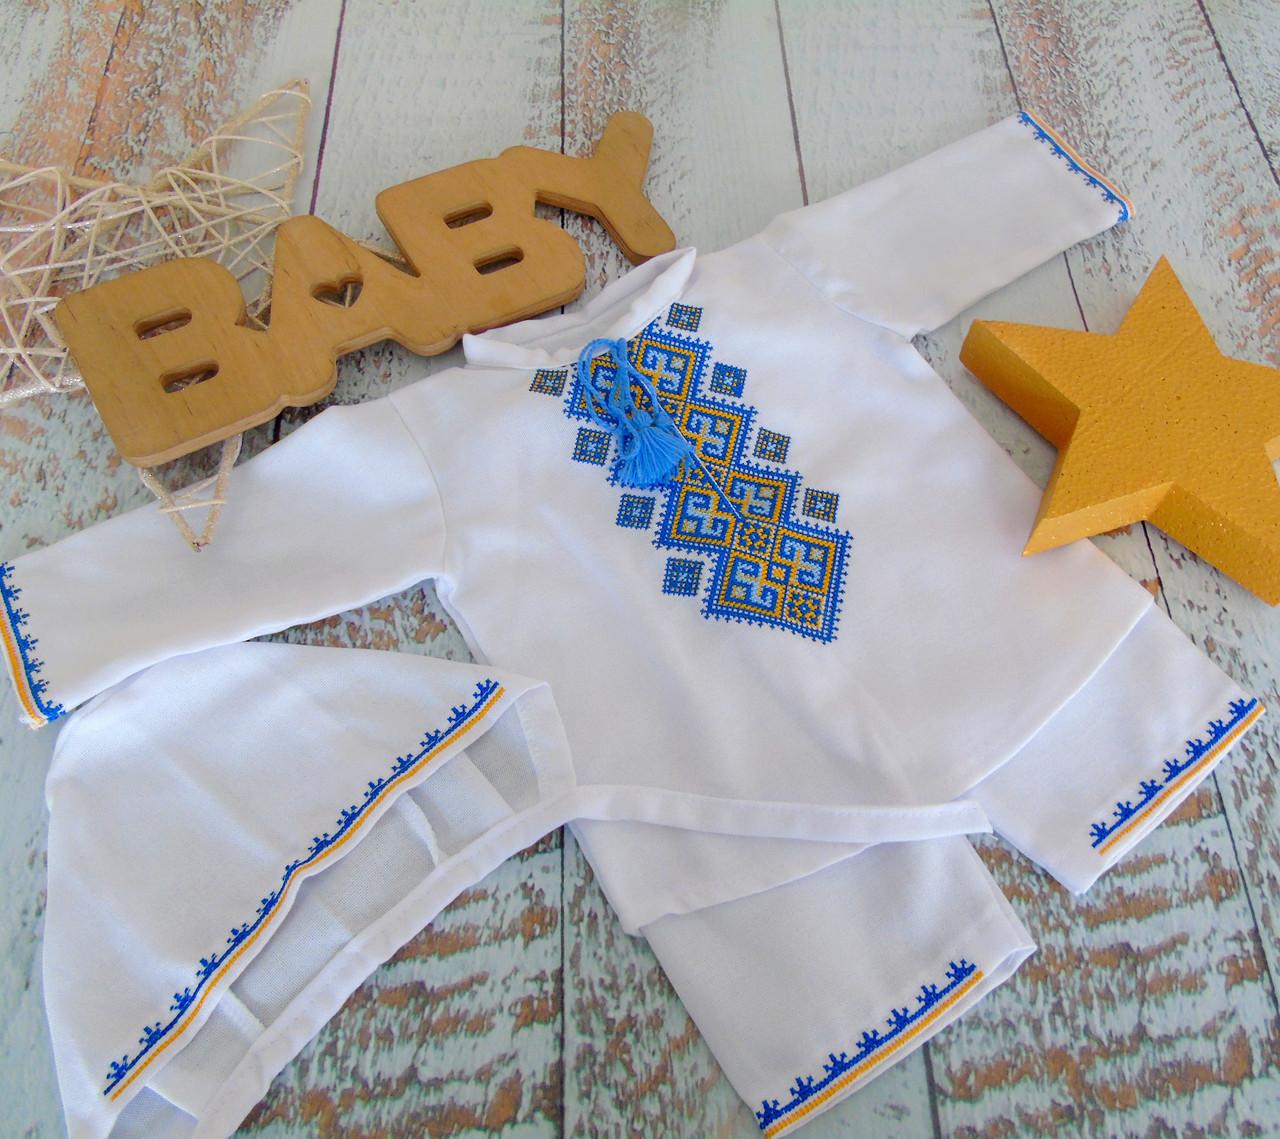 Вишитий костюм для хрестин (хлопчик) Екстра